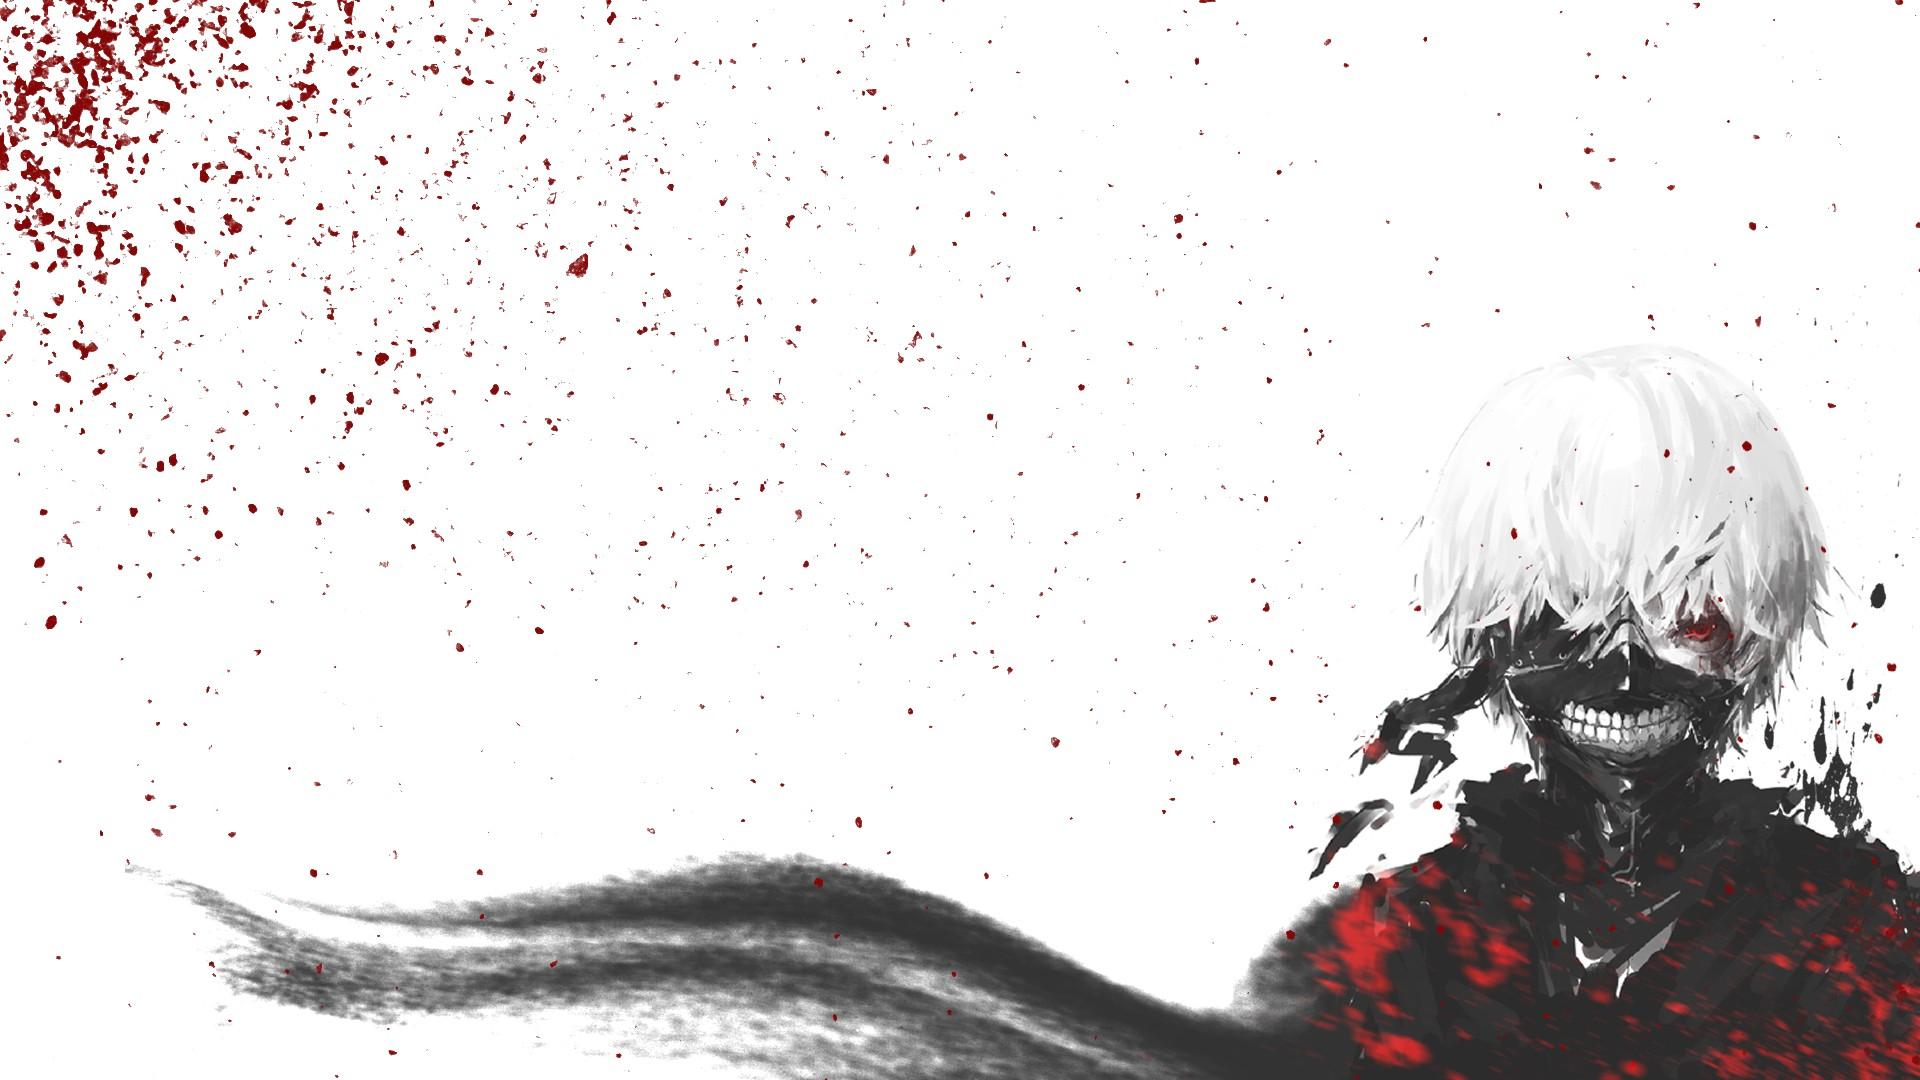 Tokyo Ghoul Ken Kaneki Wallpaper: Tokyo Ghoul HD Wallpaper